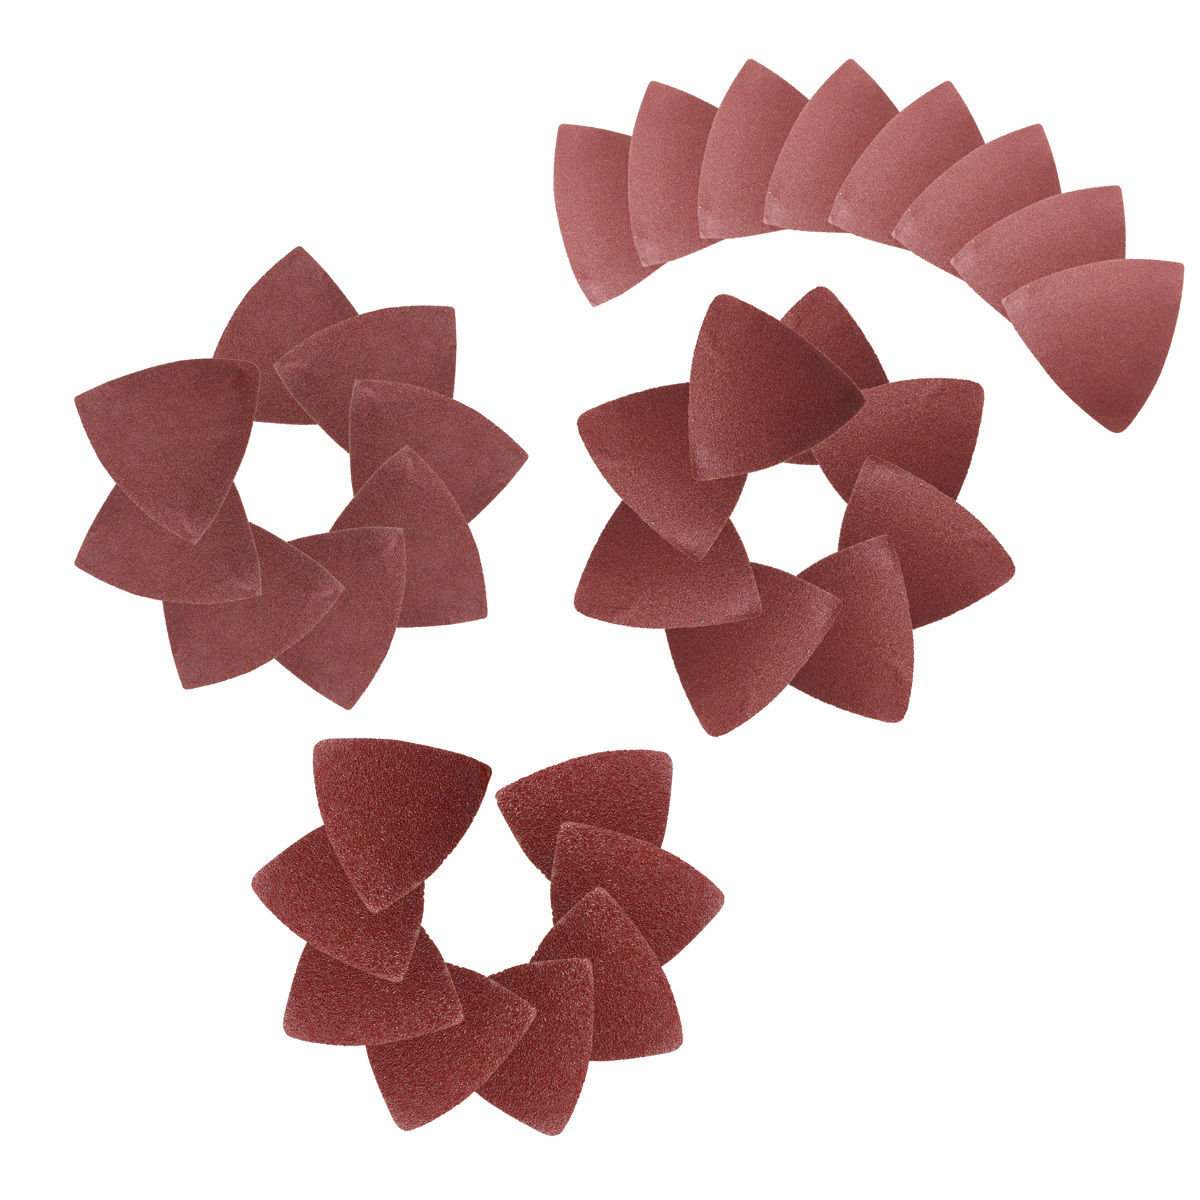 32 Pieces 60 80 120 240 Grit Triangle Grinder Sandpaper Pad Sanding Sheet Discs Metalworking Abrasive Tools